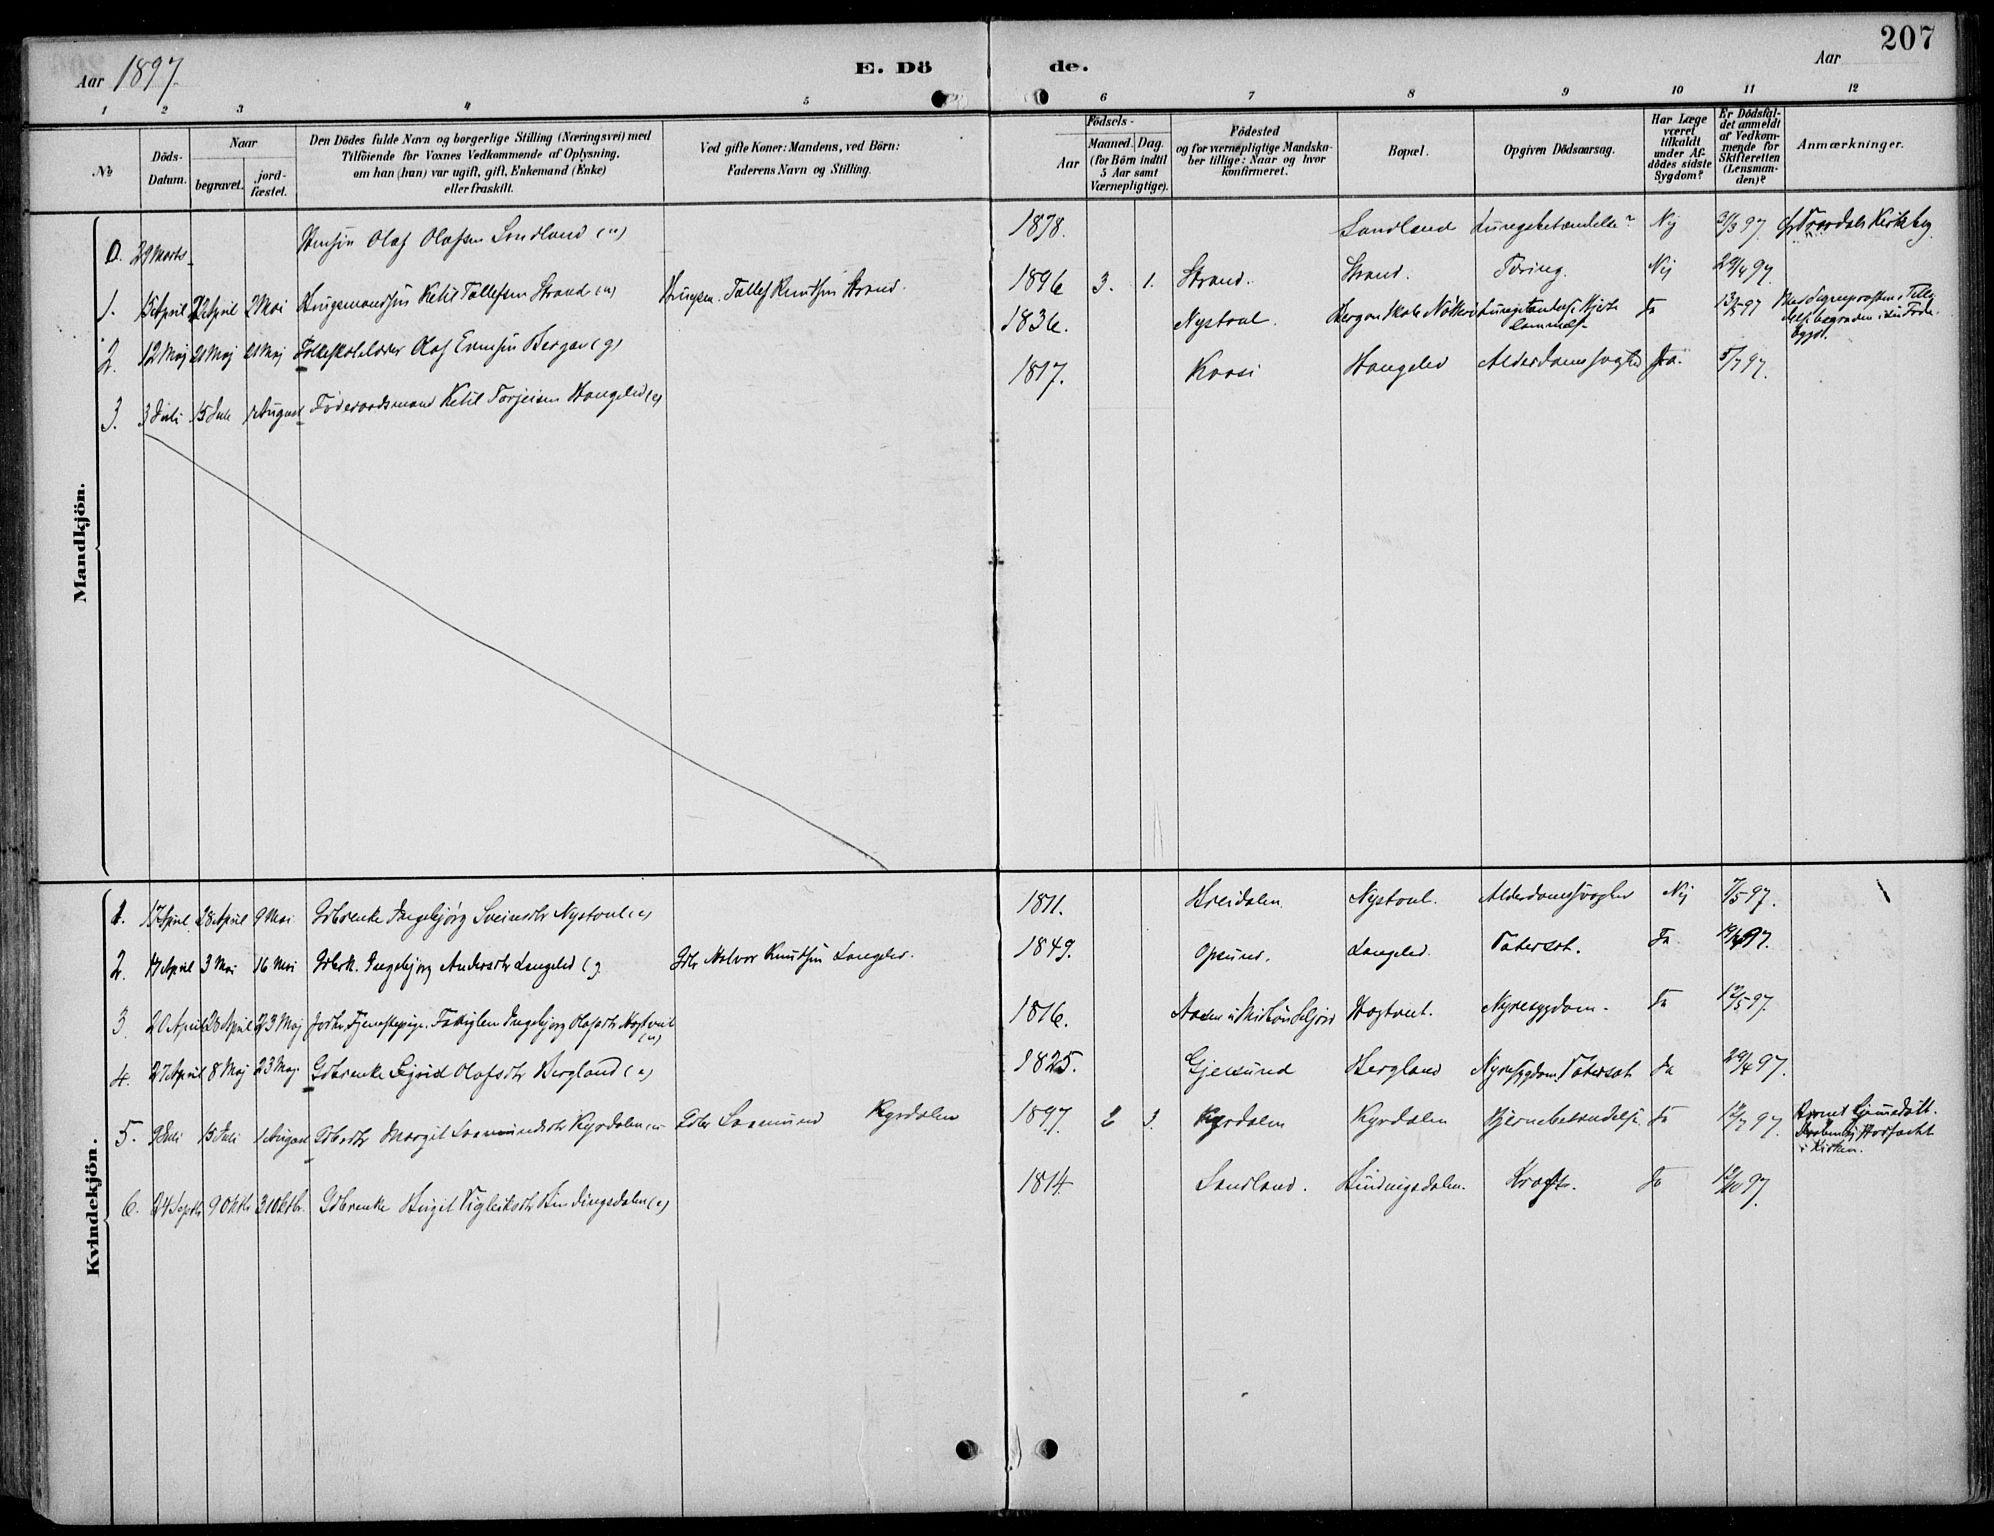 SAKO, Kviteseid kirkebøker, F/Fb/L0002: Ministerialbok nr. II 2, 1882-1916, s. 207